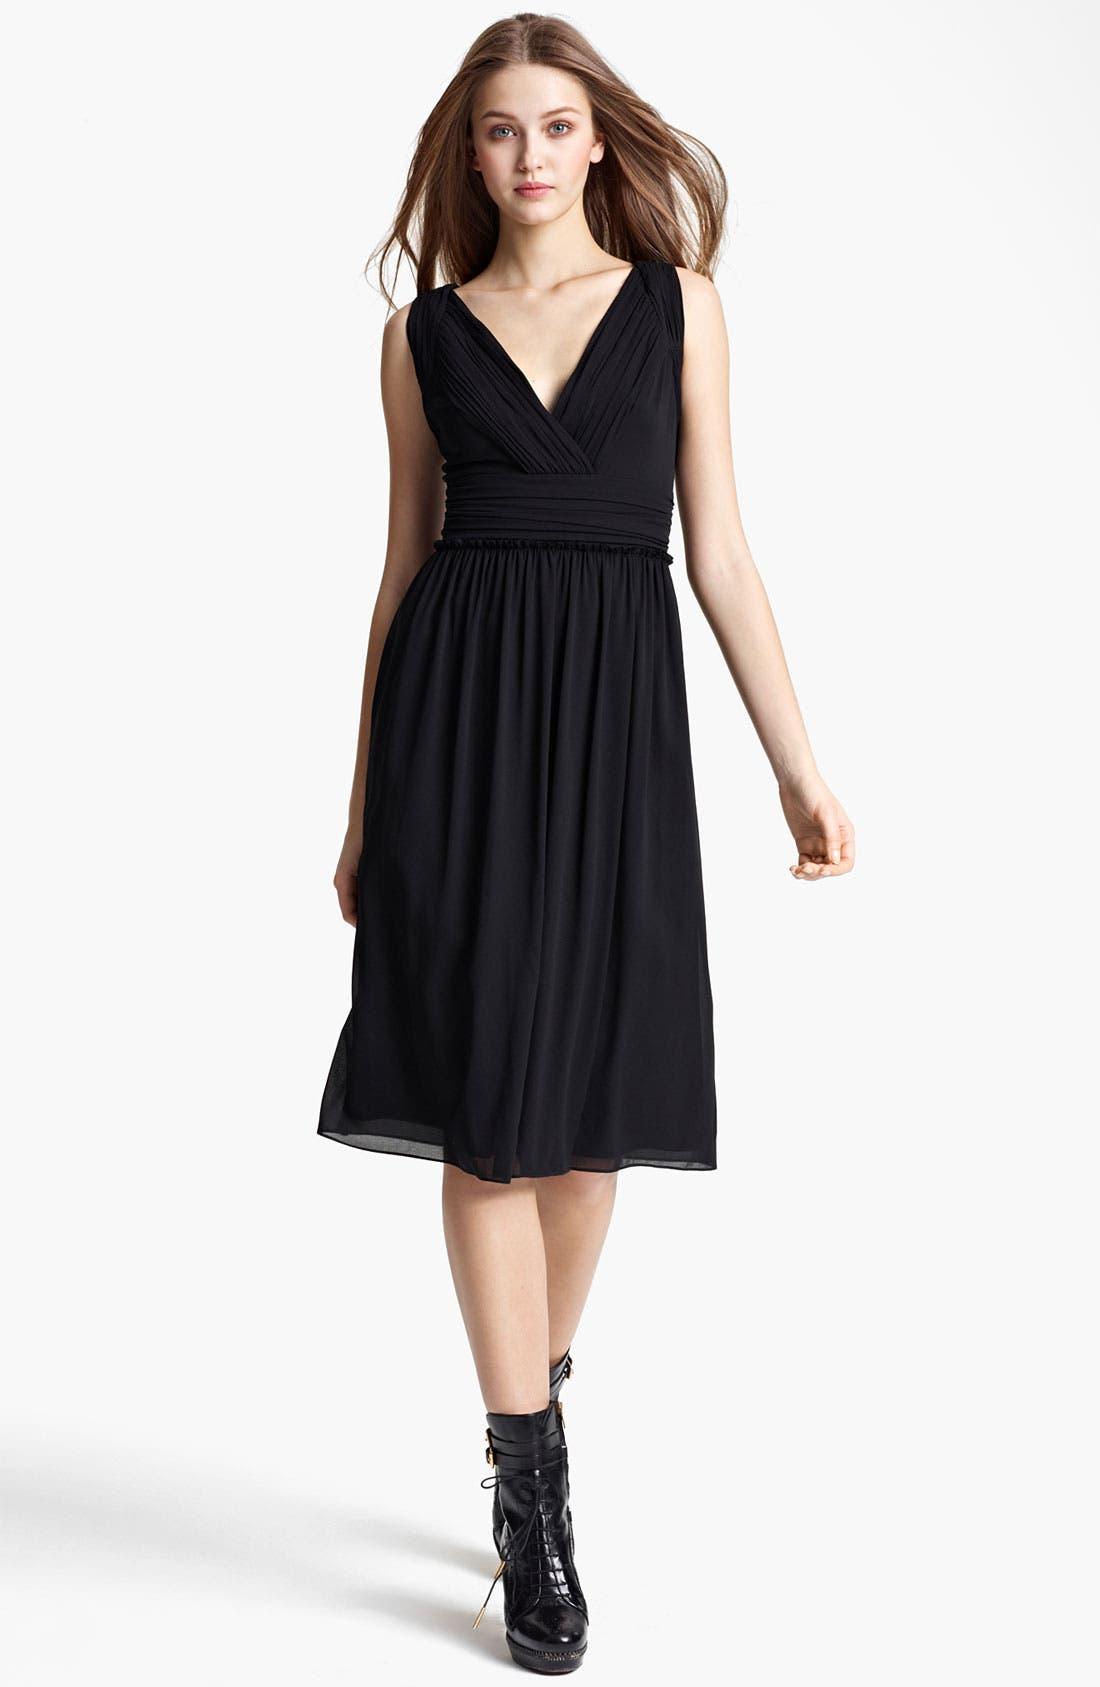 Alternate Image 1 Selected - Burberry London Pleat Crepe Dress